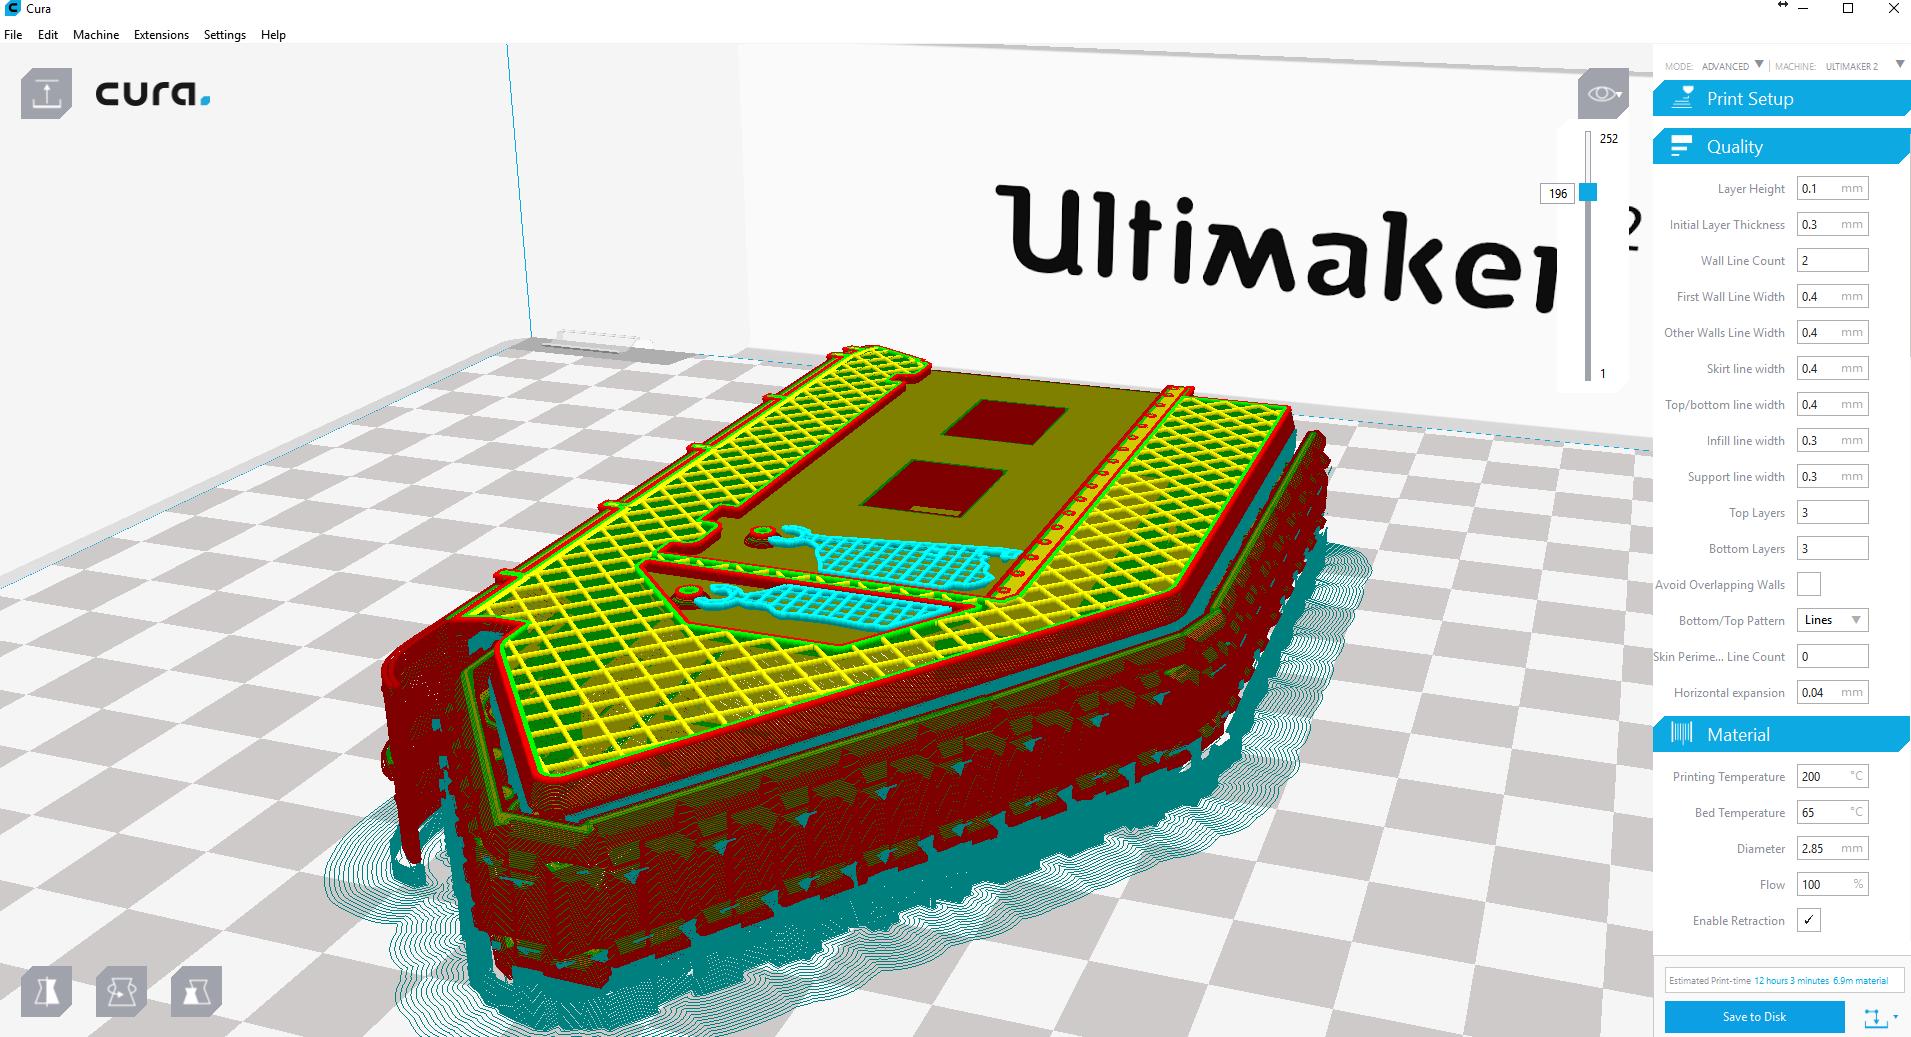 Layers of model in Cura slicer